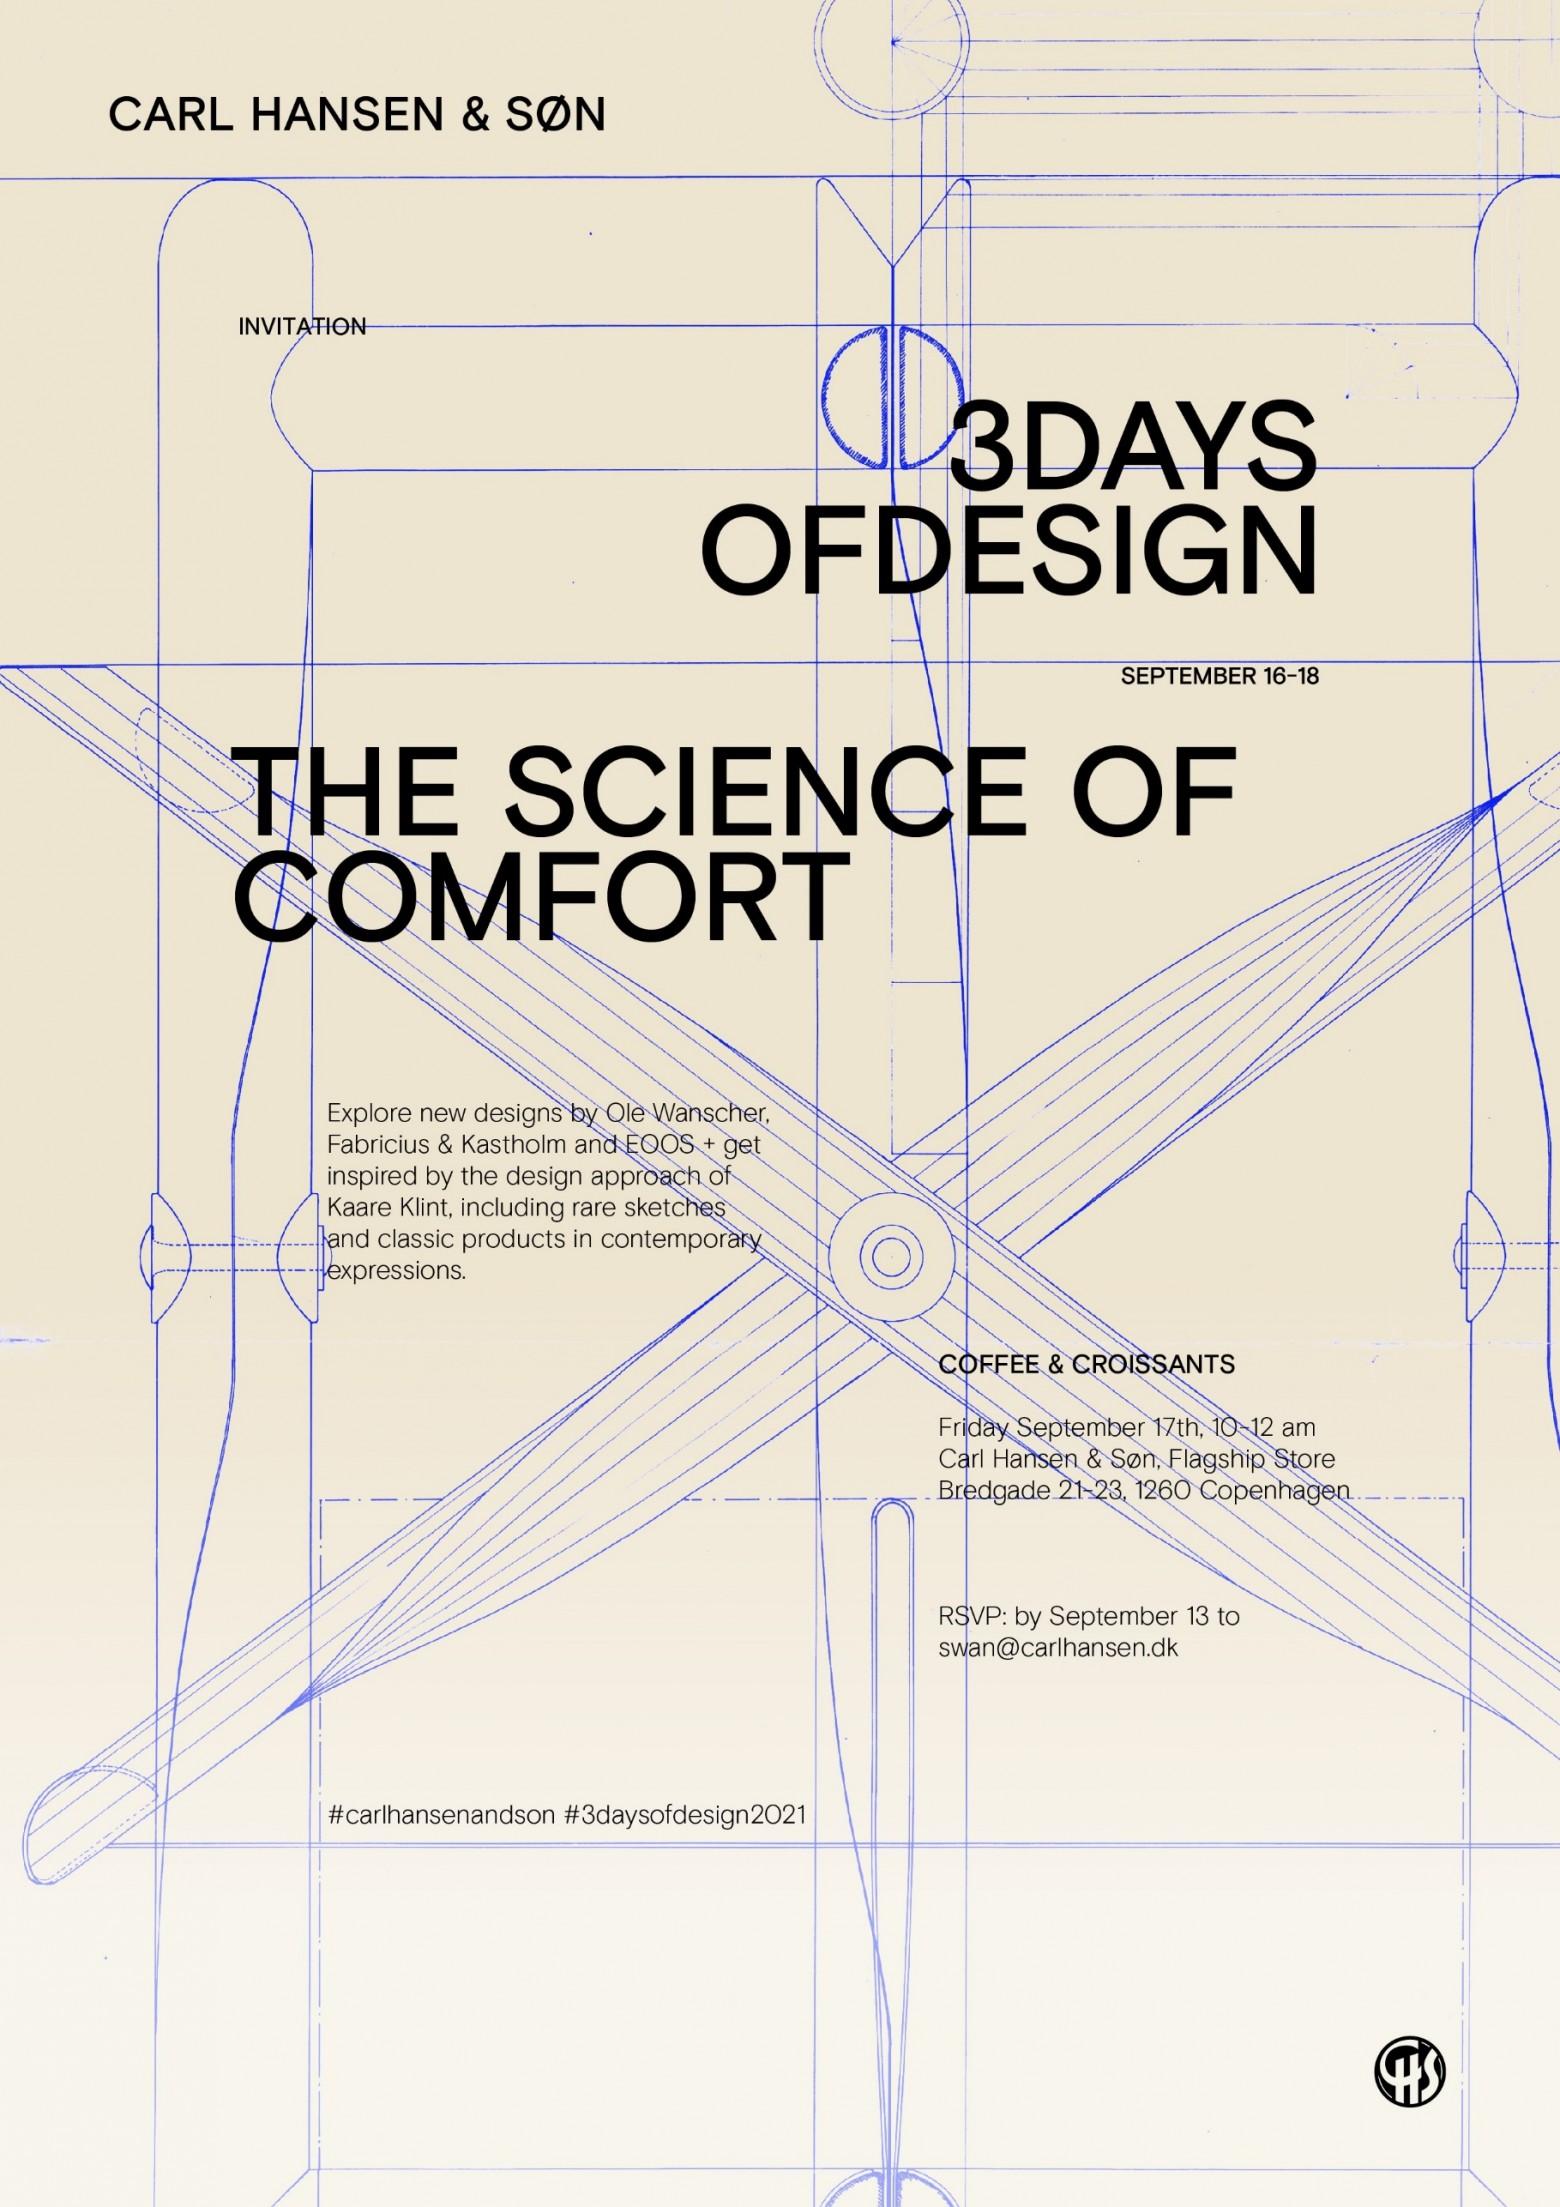 3 Days of Design - Copenhagen - Carl Hansen & Son:  17 September Coffee & Croissants  Victors Design Agency